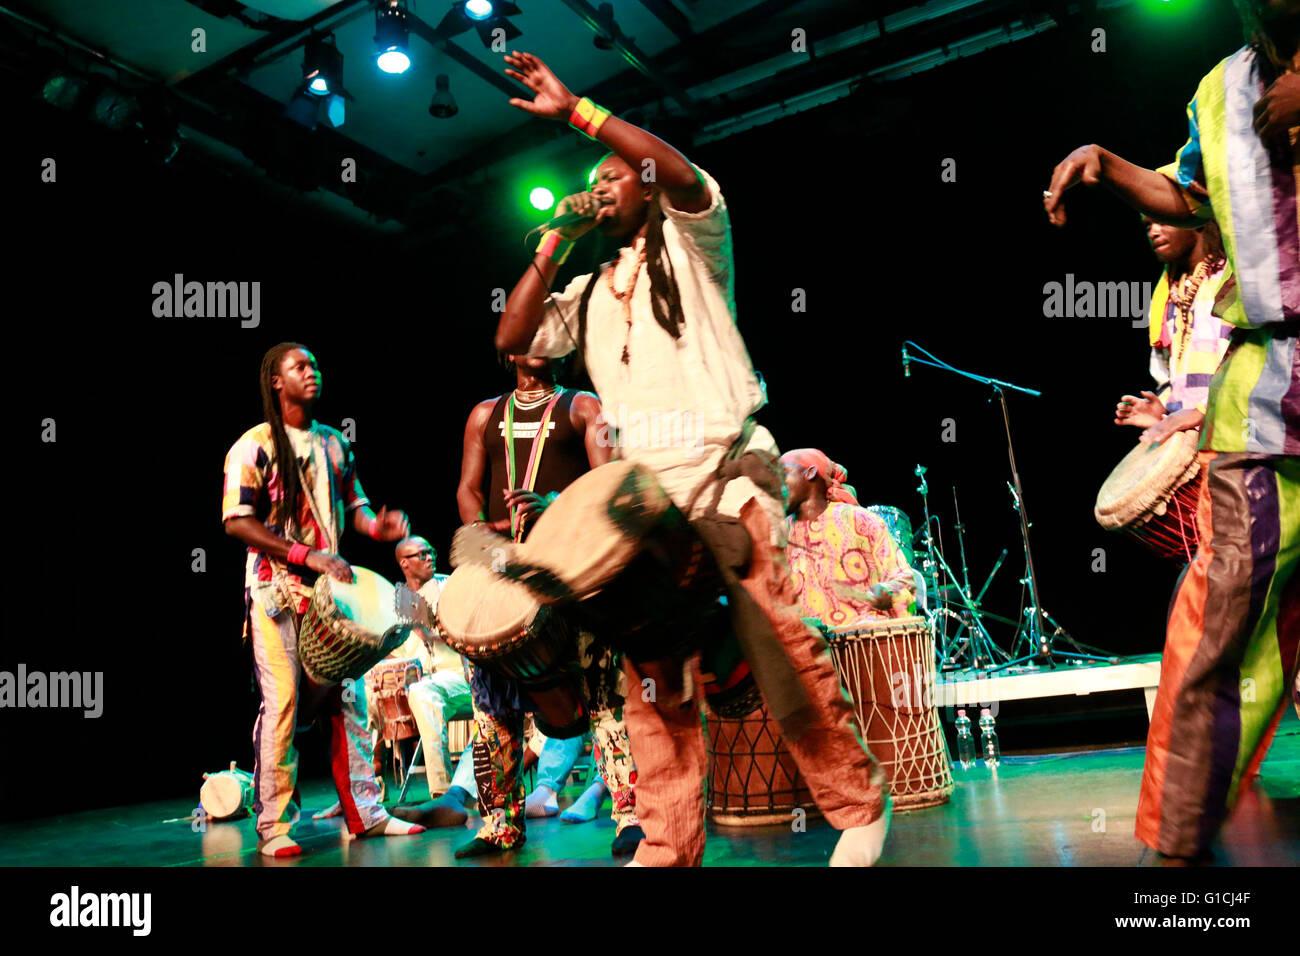 Nago Koite und SAF SAP (Senegal) - Global Drums Festival, Werkstatt der Kulturen, 17. Januar 2015, Berlín-Kreuzberg. Imagen De Stock